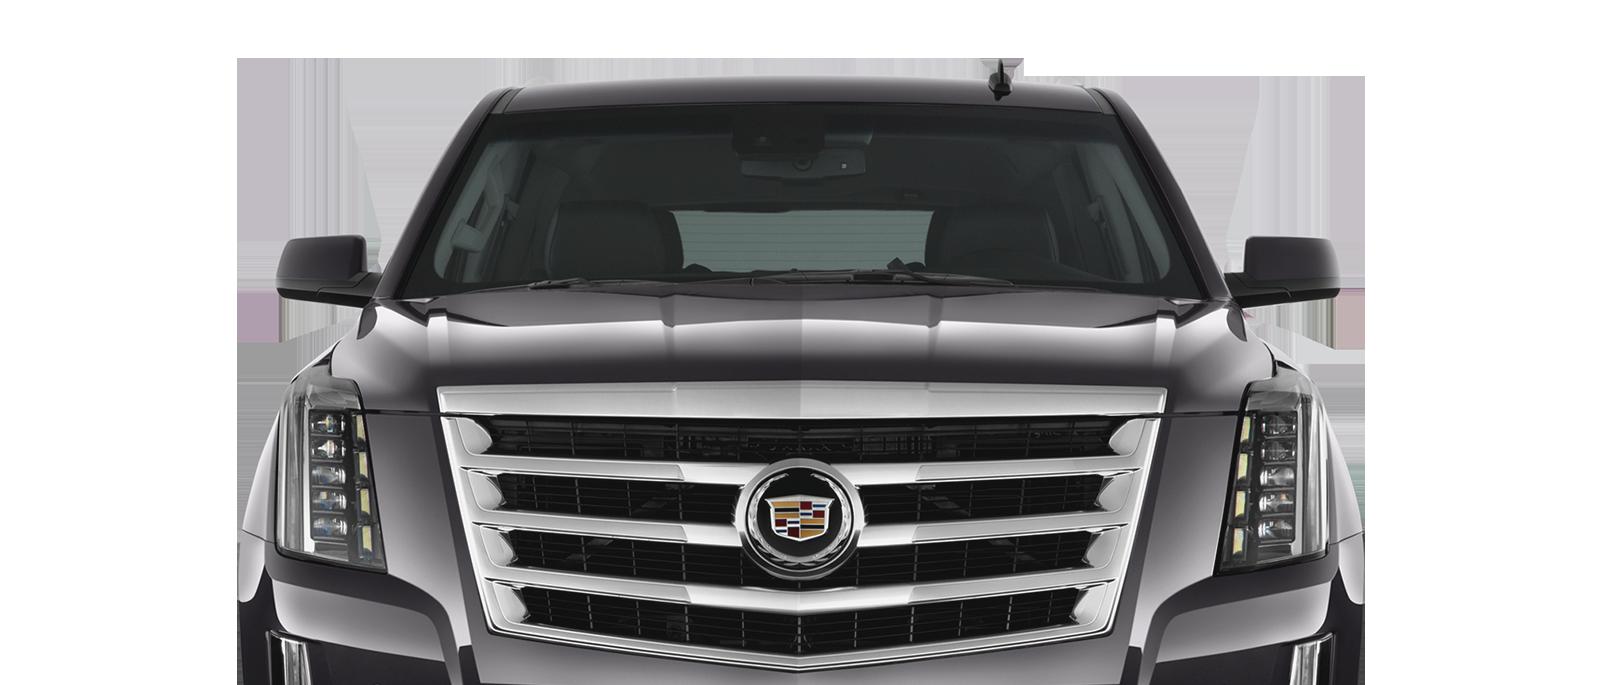 Atl Car Rental: Rent A Cadillac In Massachusetts